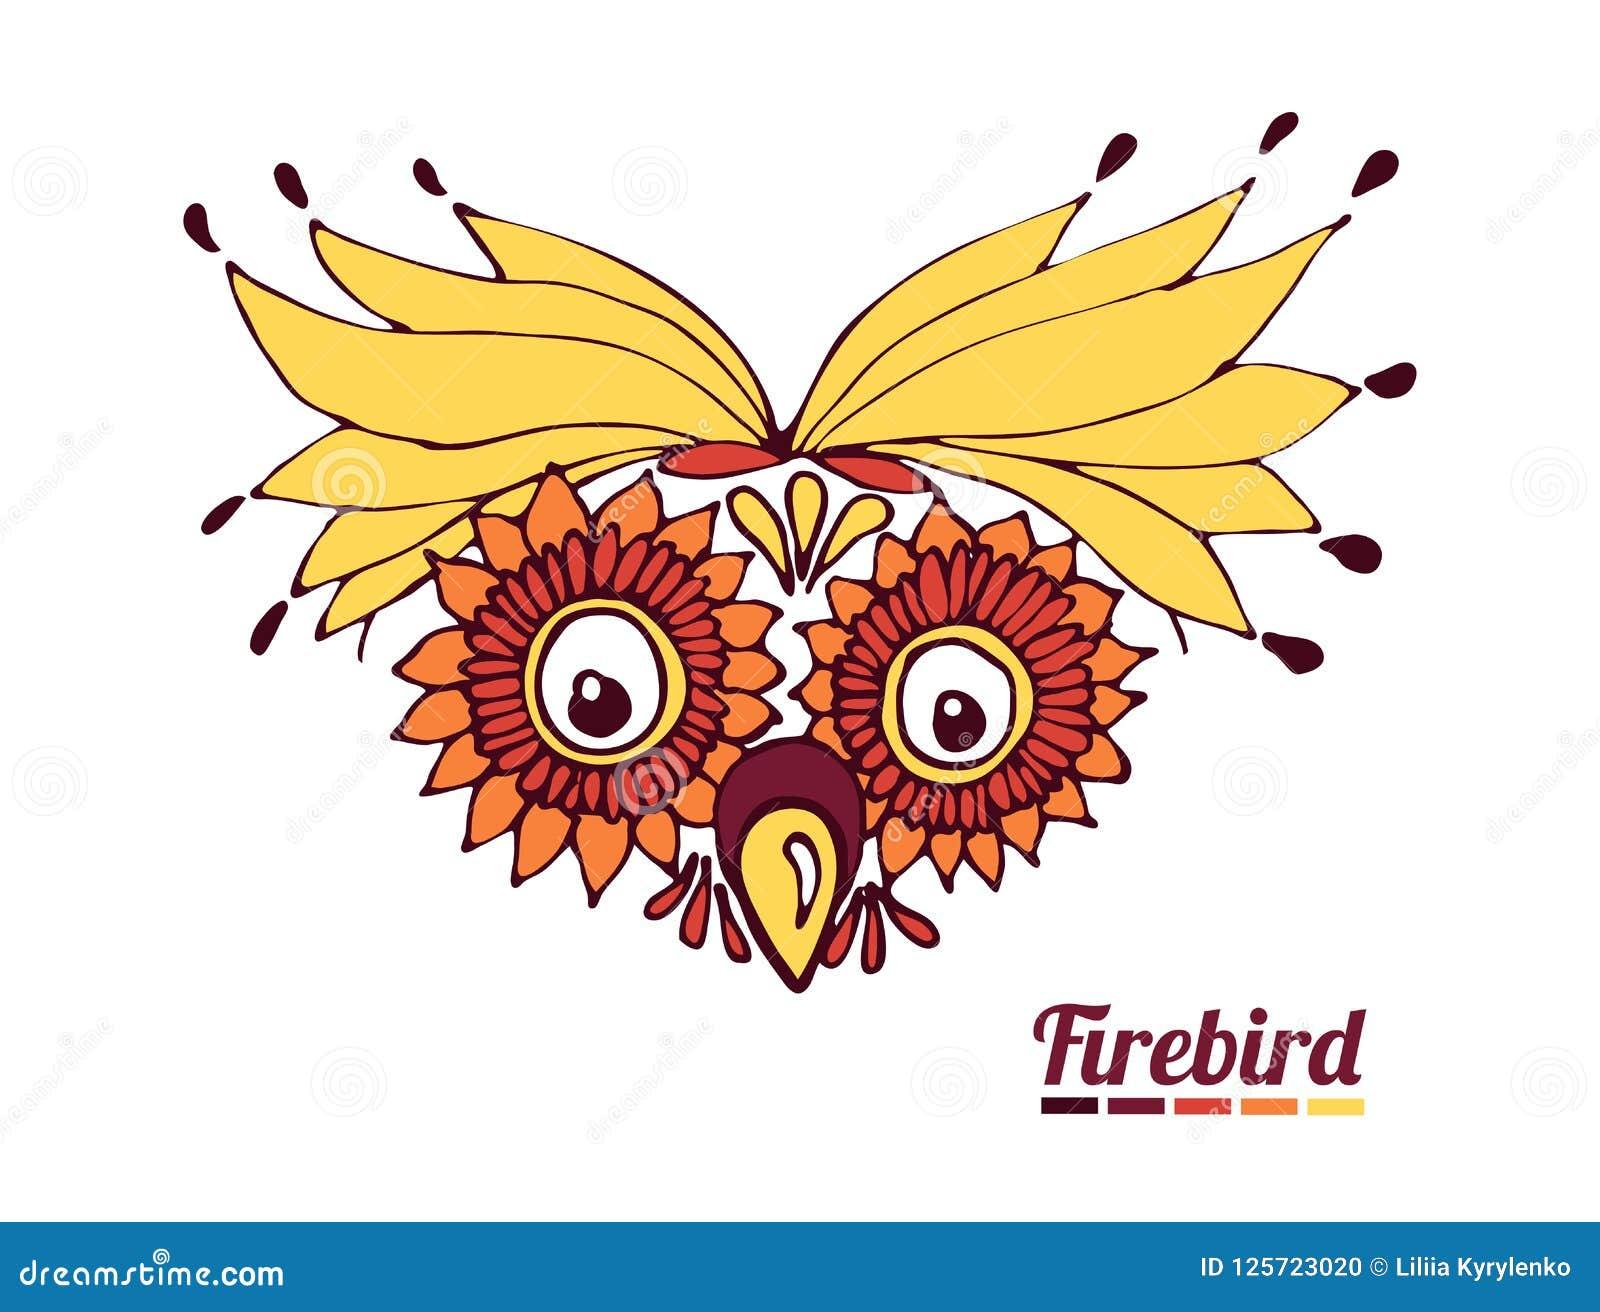 funny muzzle firebird. a fantastic parrot or an owl